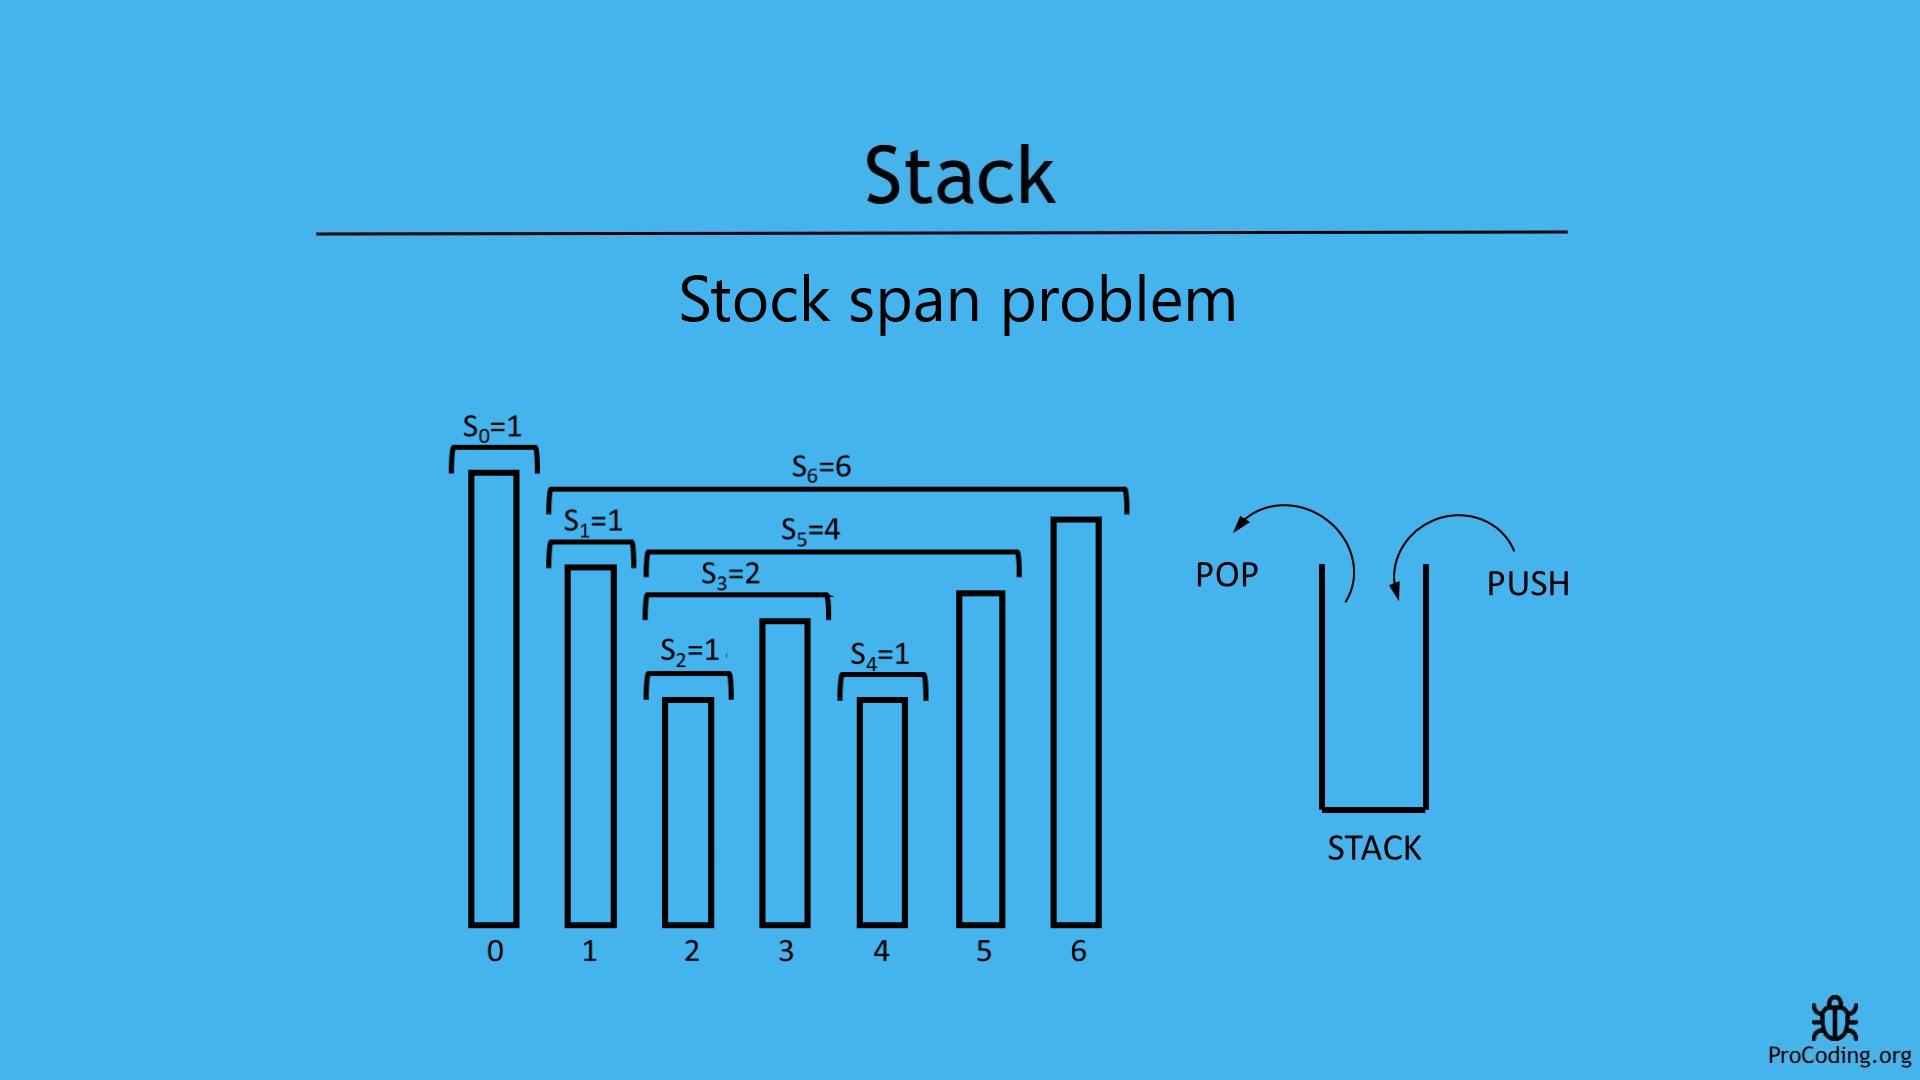 Stock span problem